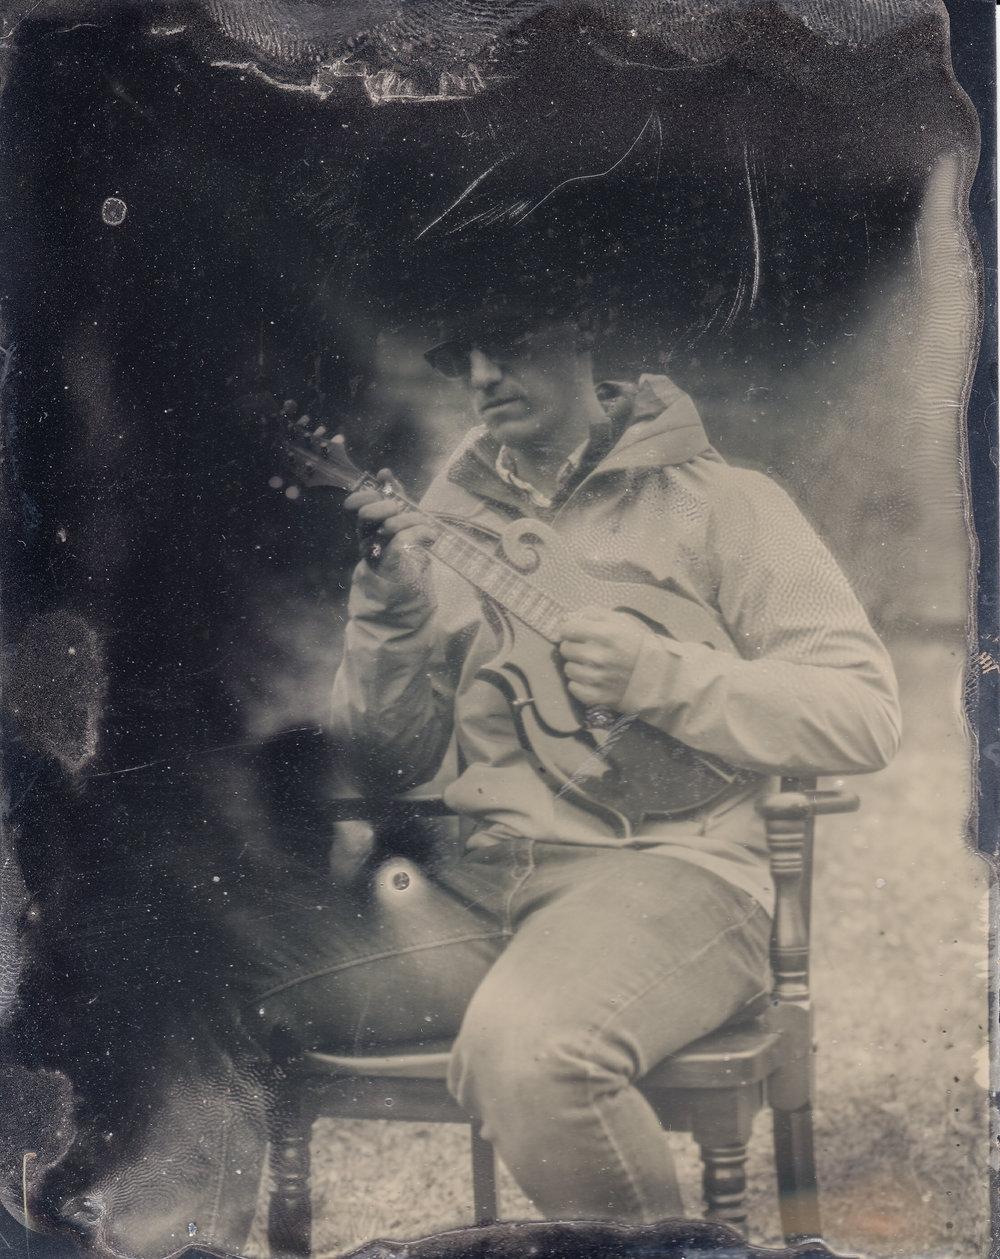 Musician tintypes by artist photographer Steven Glynn